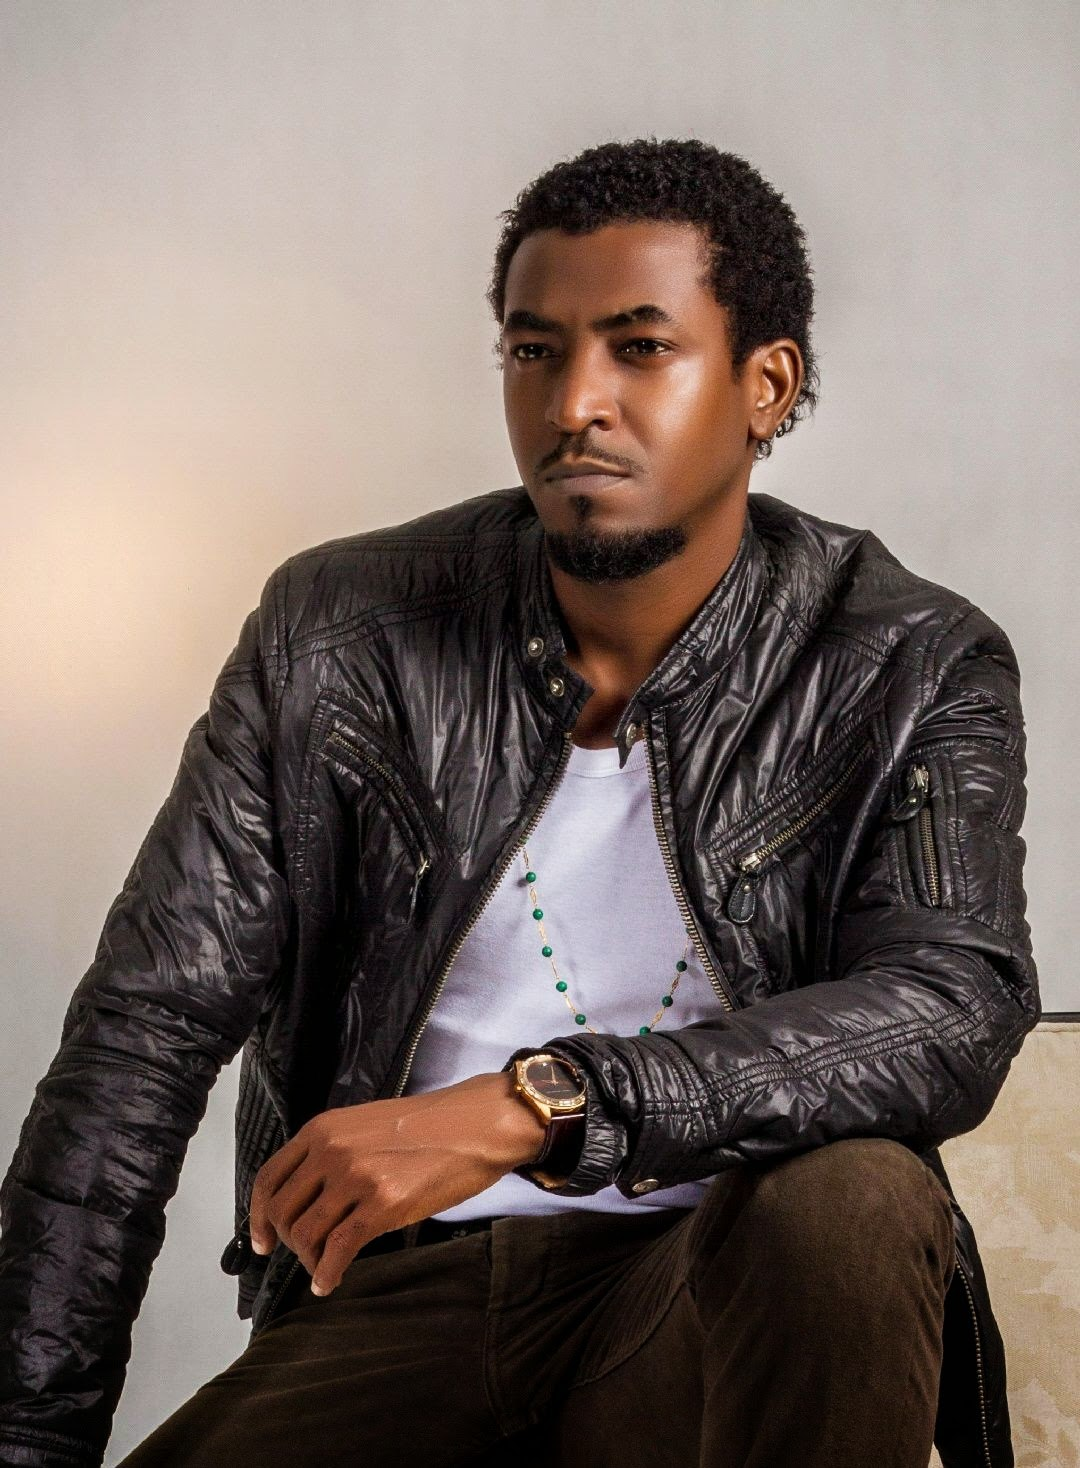 Demola Adedoyin gets on the list with a brilliant performance in 2018. [Instagram/demola.adedoyin]